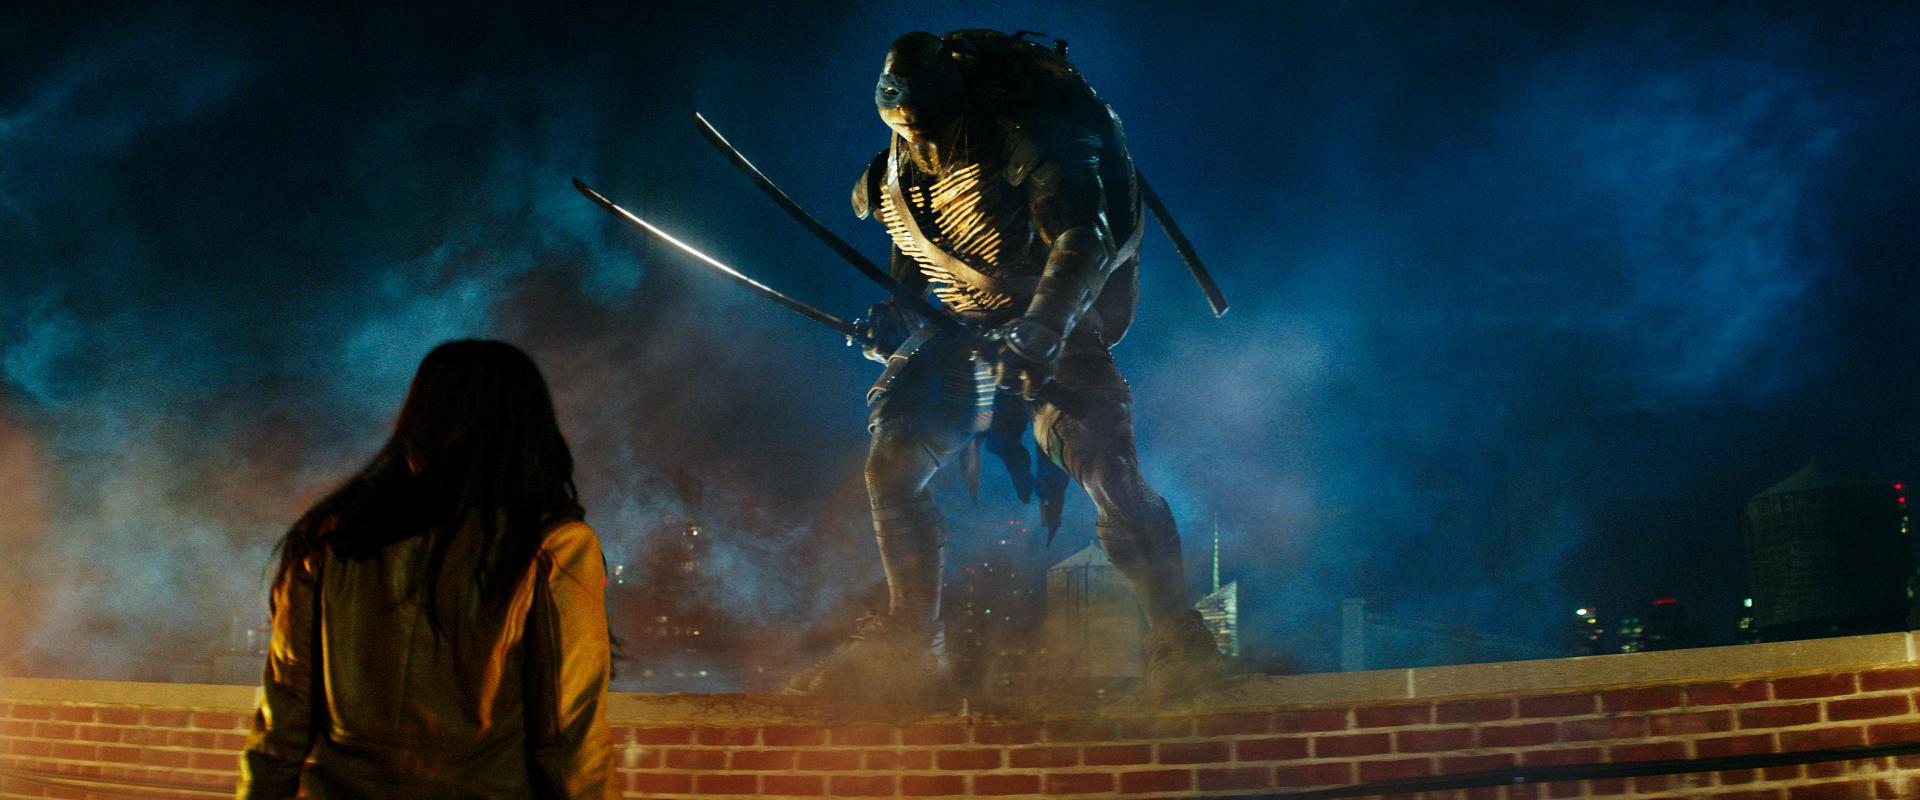 Regresan las Tortugas Ninja al cine #TMNT.